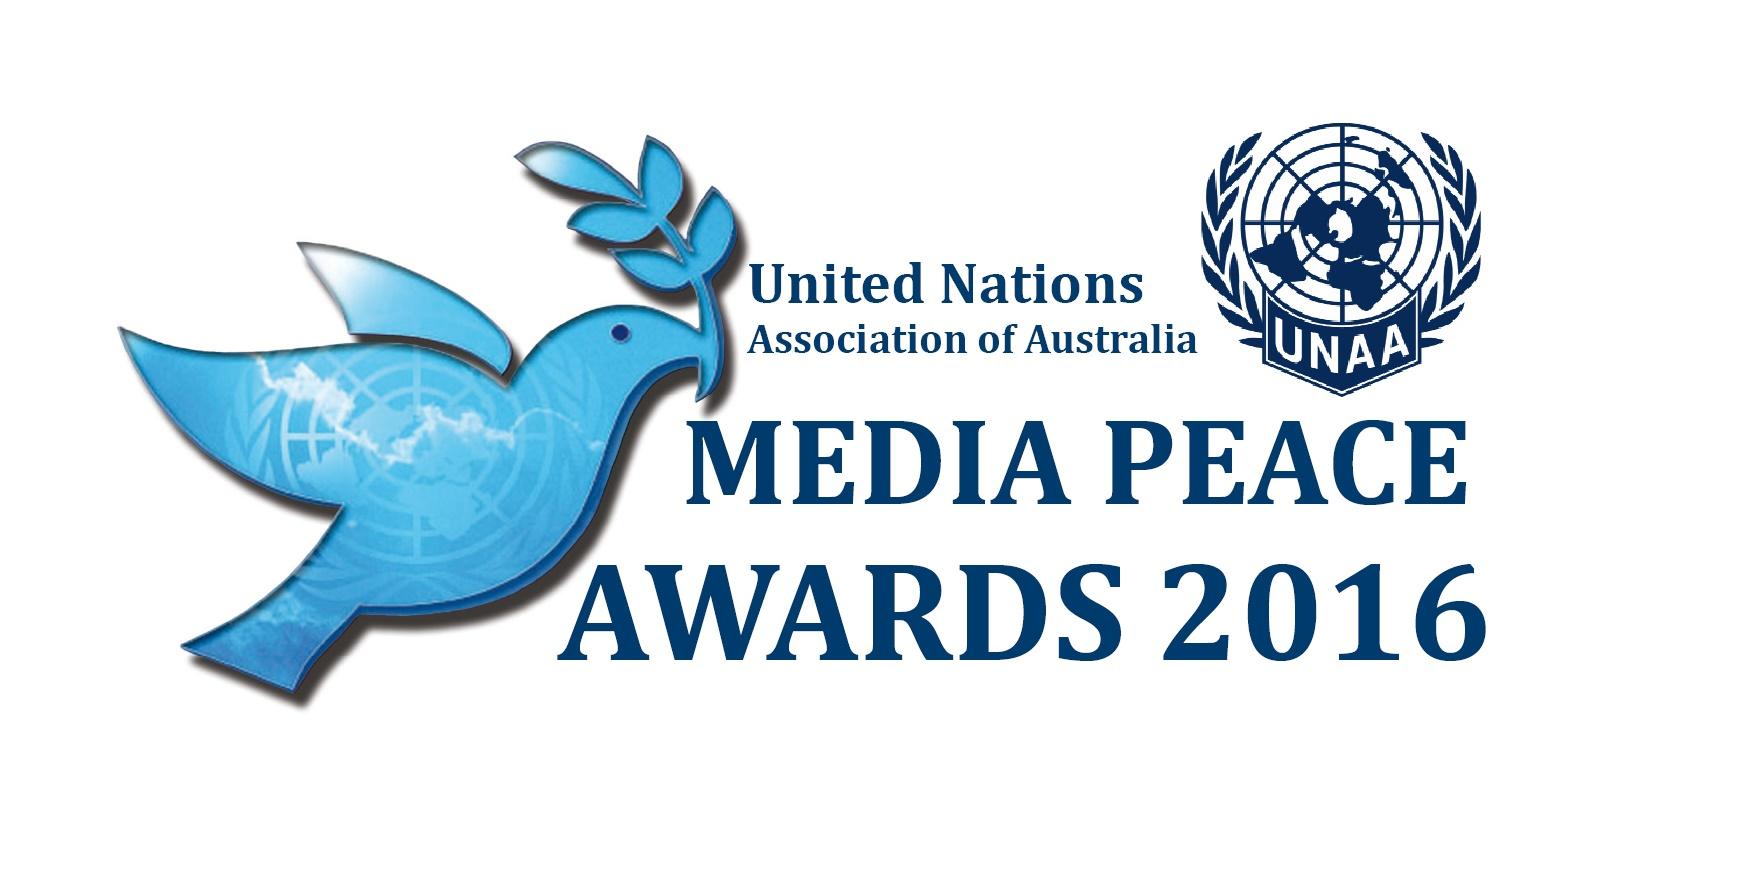 UNAA Media Peace Awards 2016